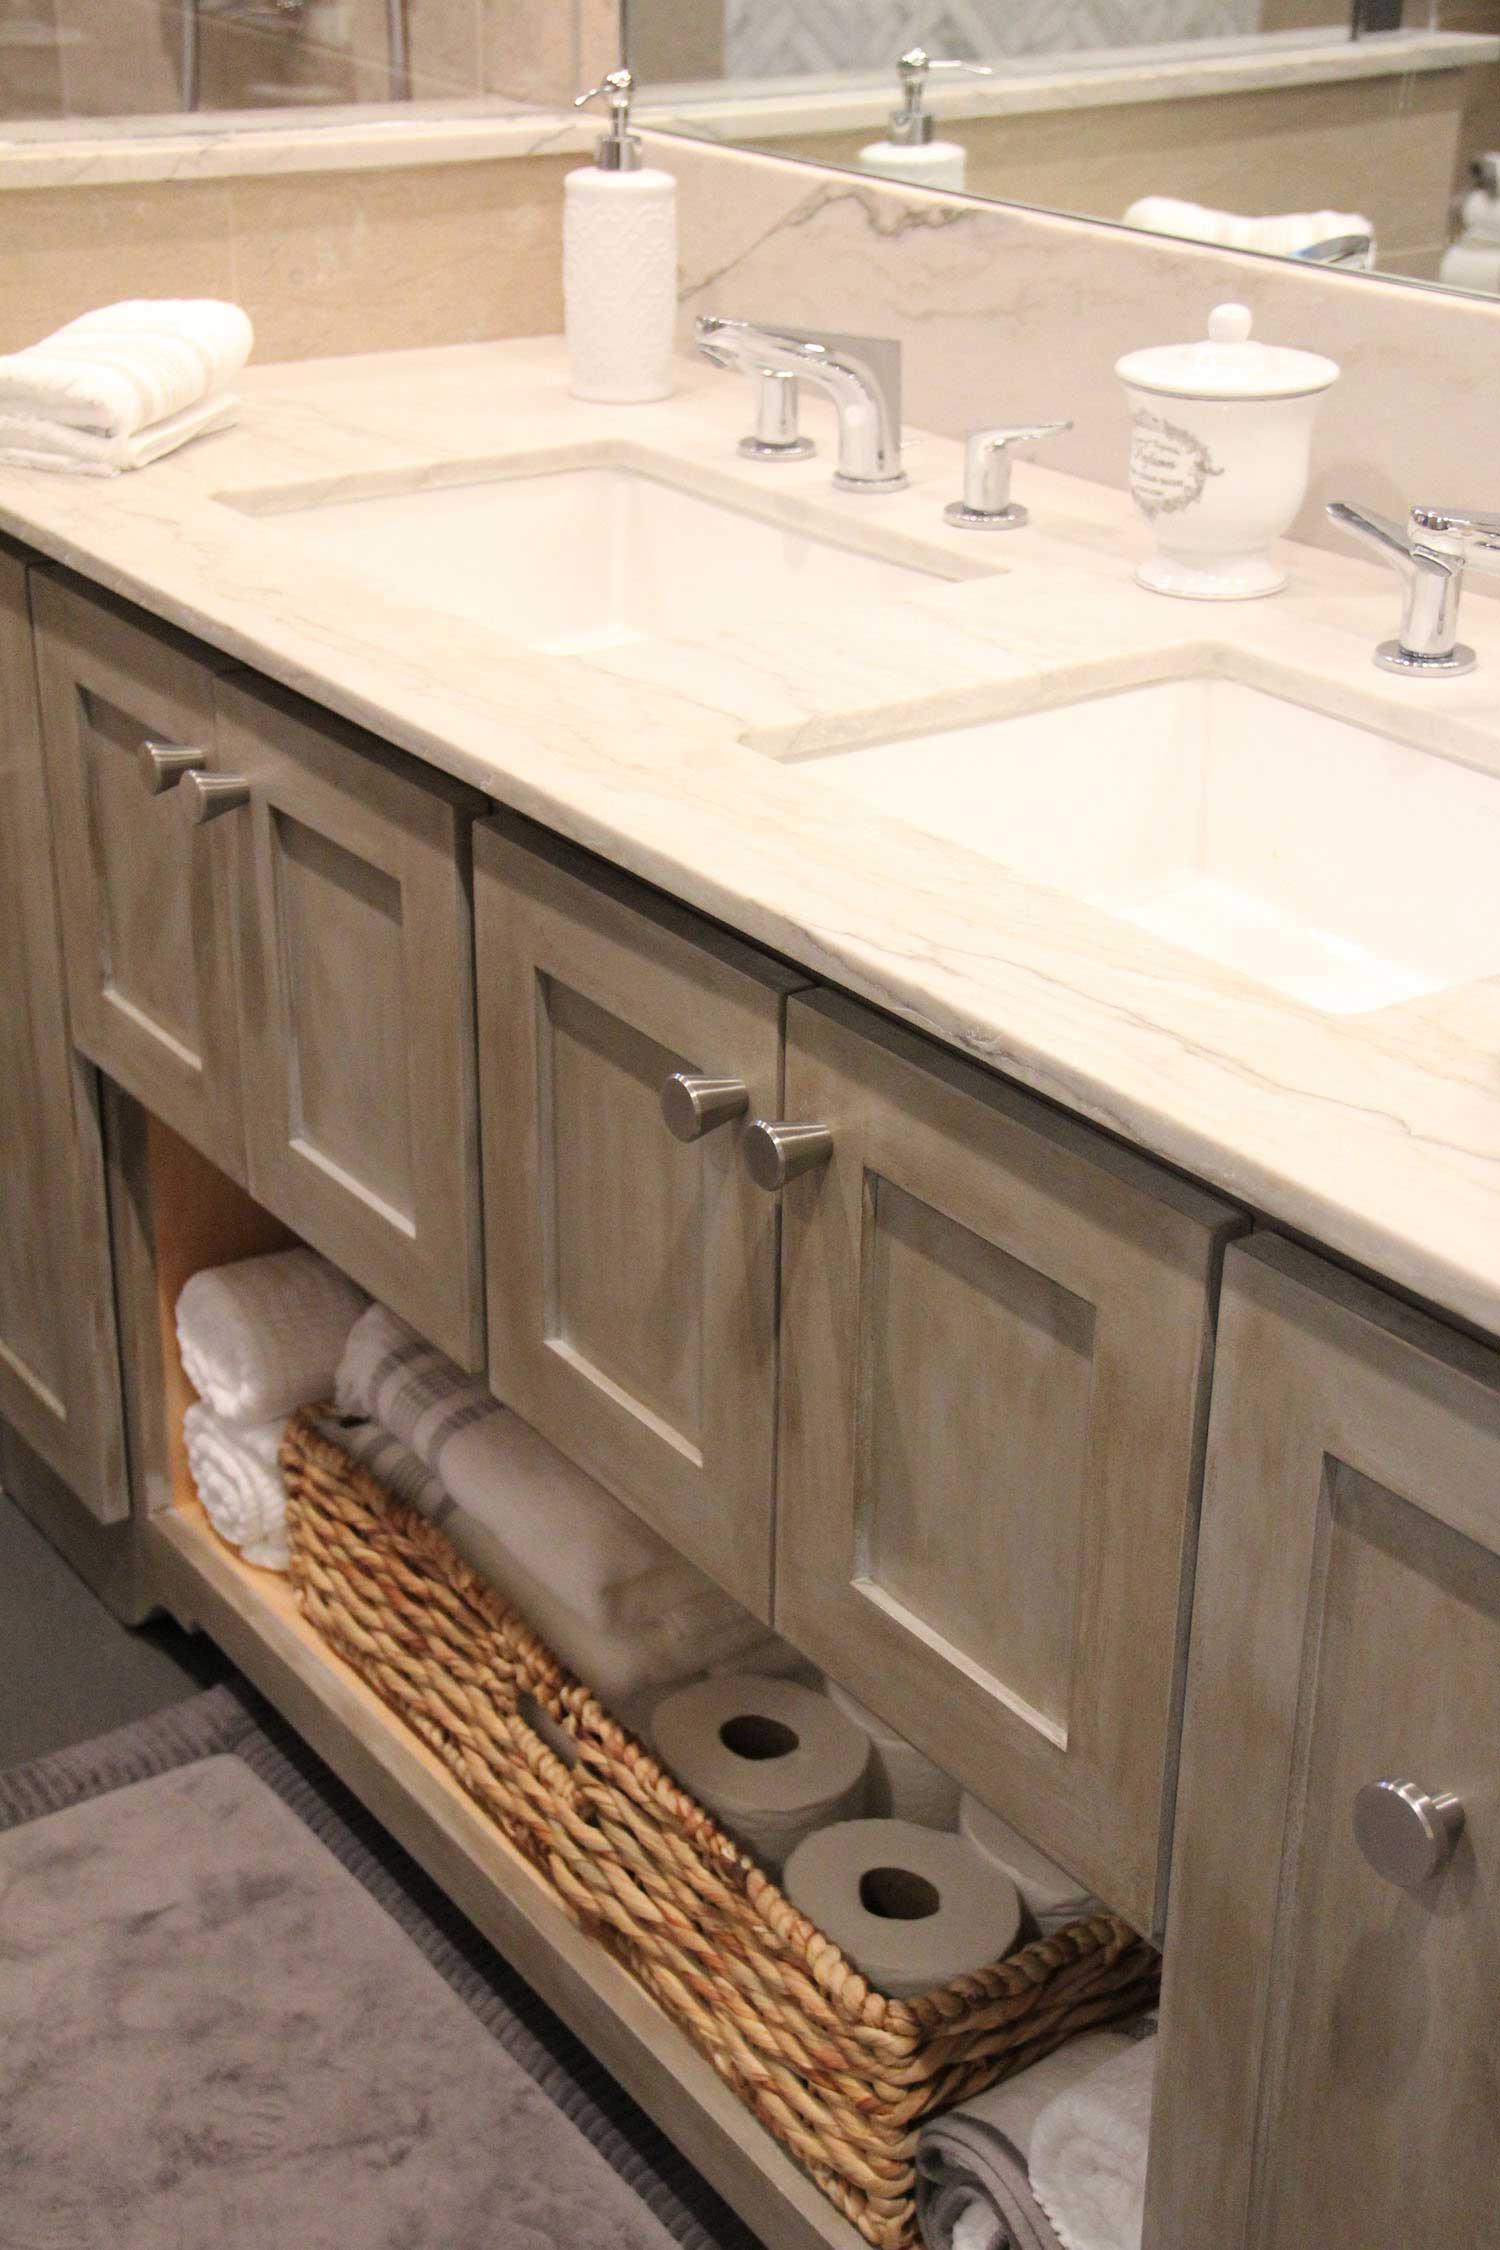 Custom Built Bathroom Sink and Cabinet